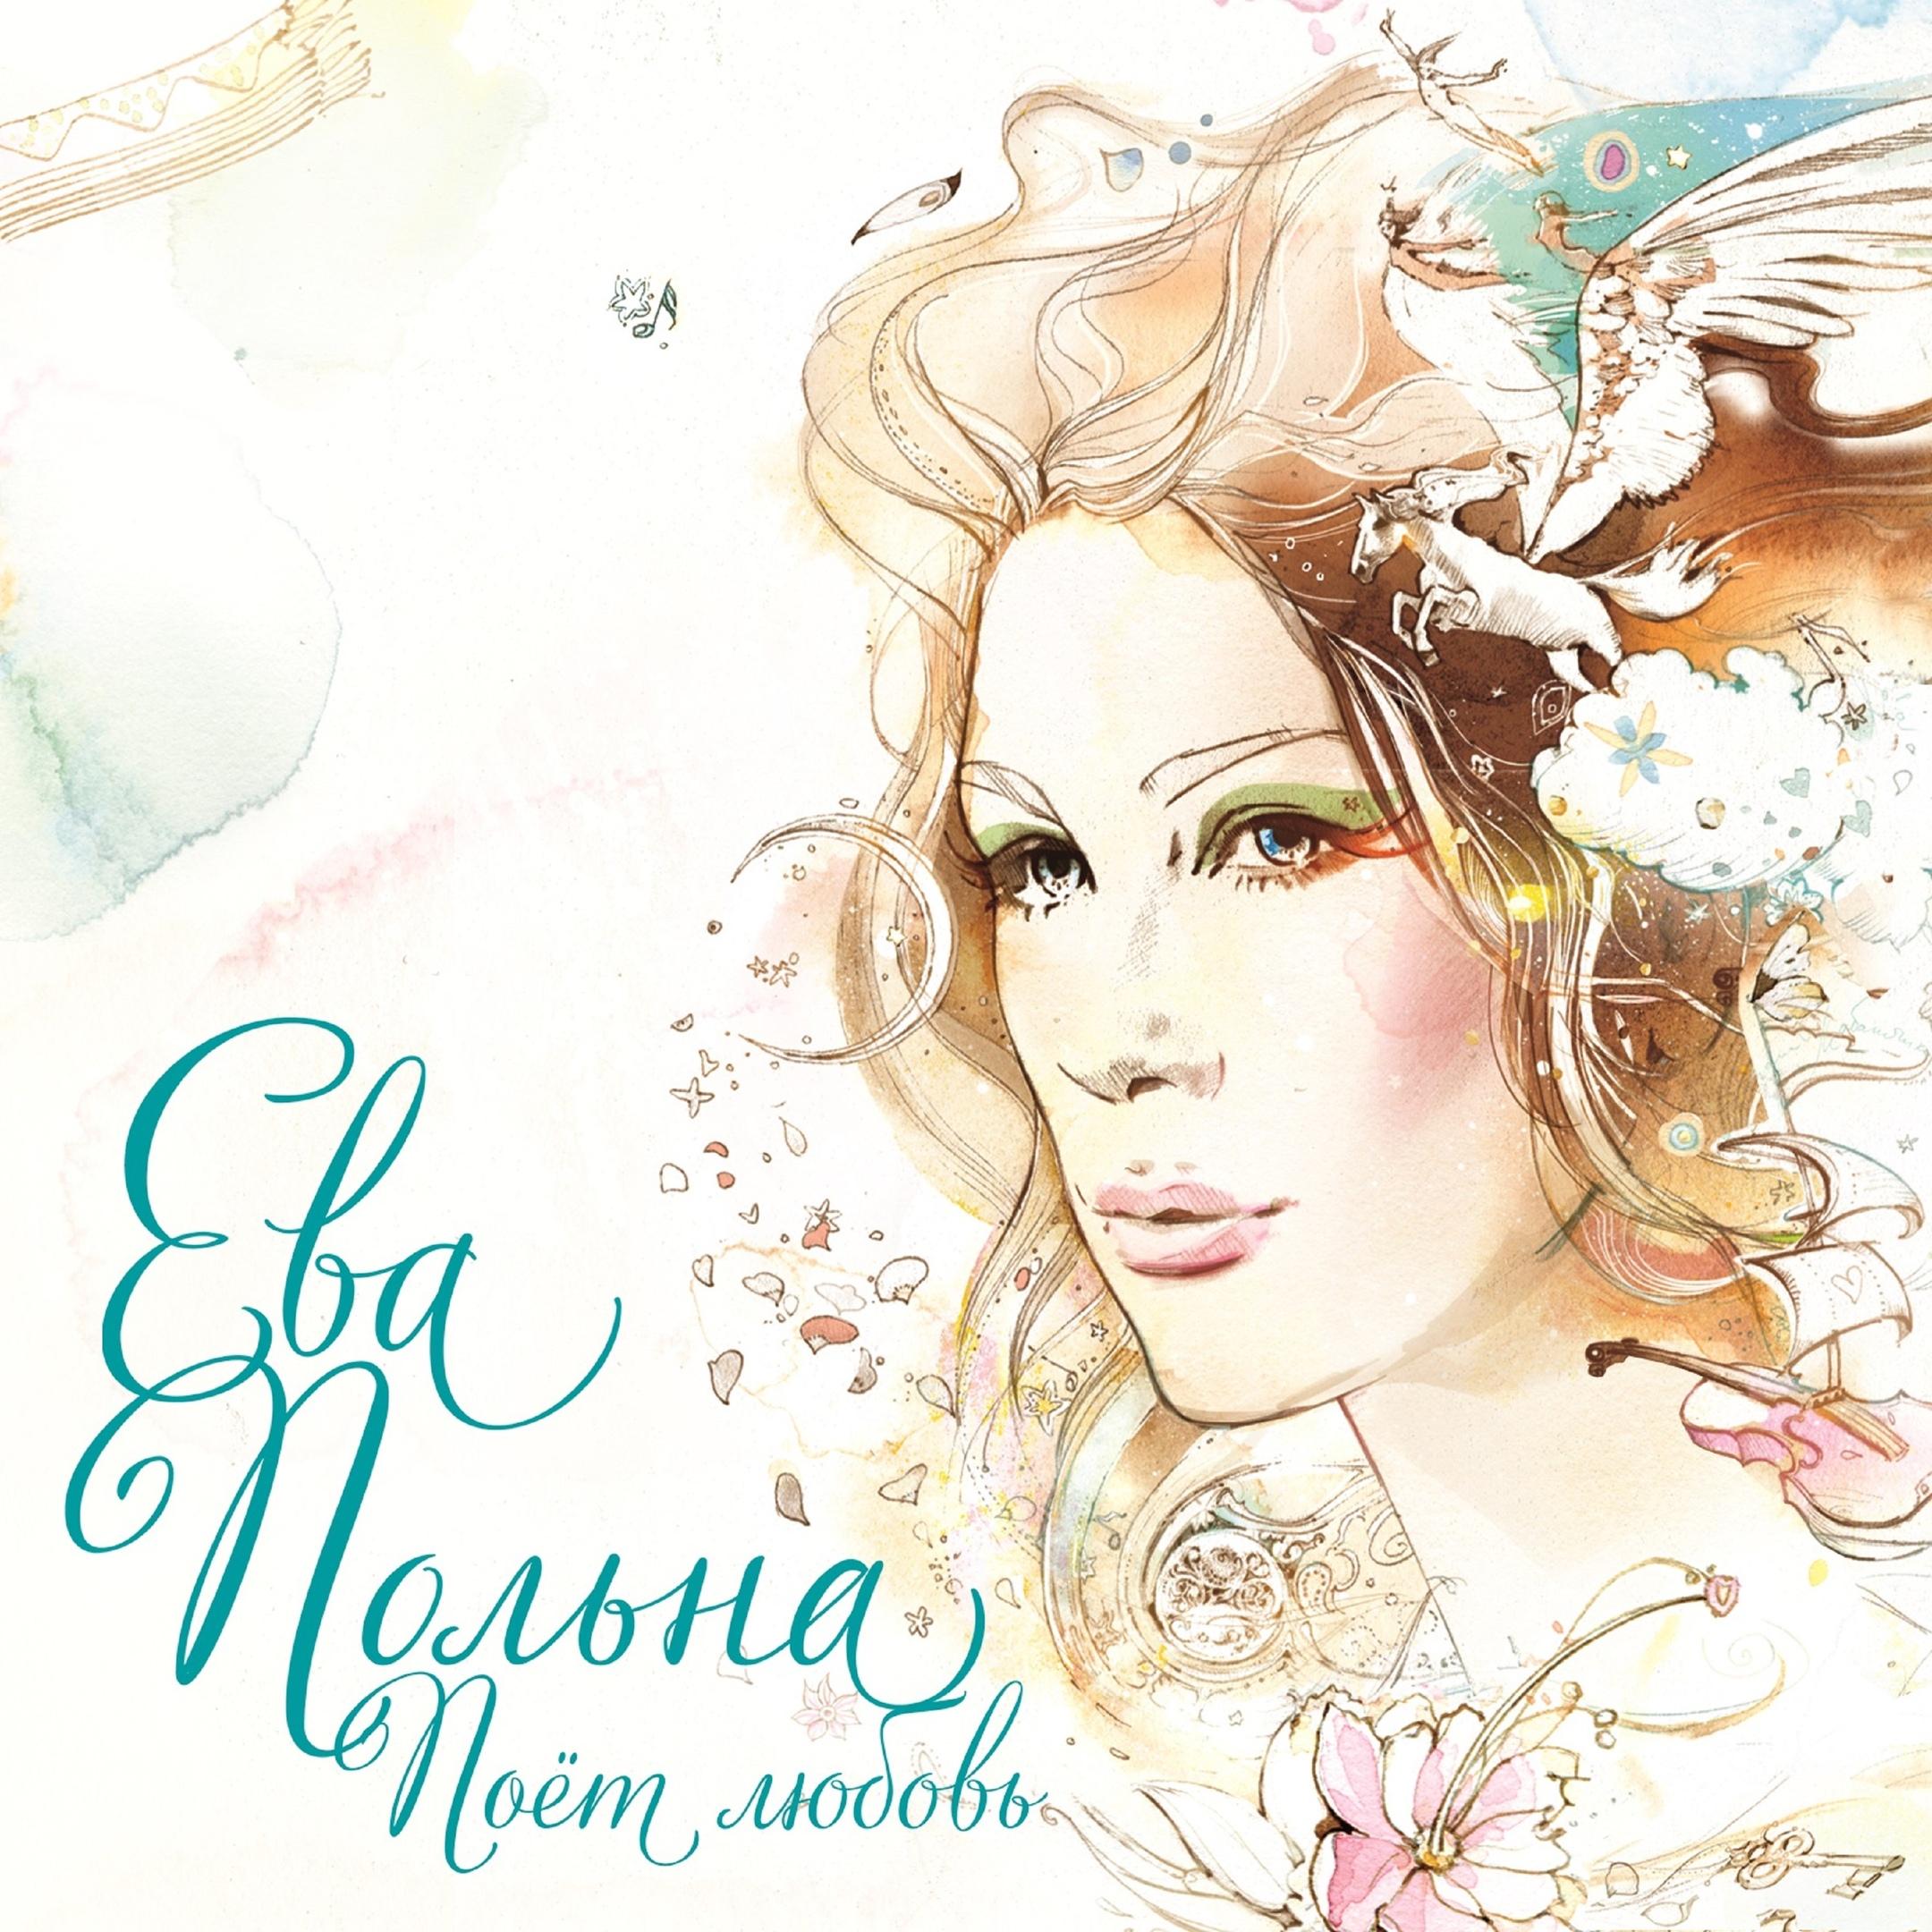 Ева Польна album Поёт любовь (Deluxe Version)